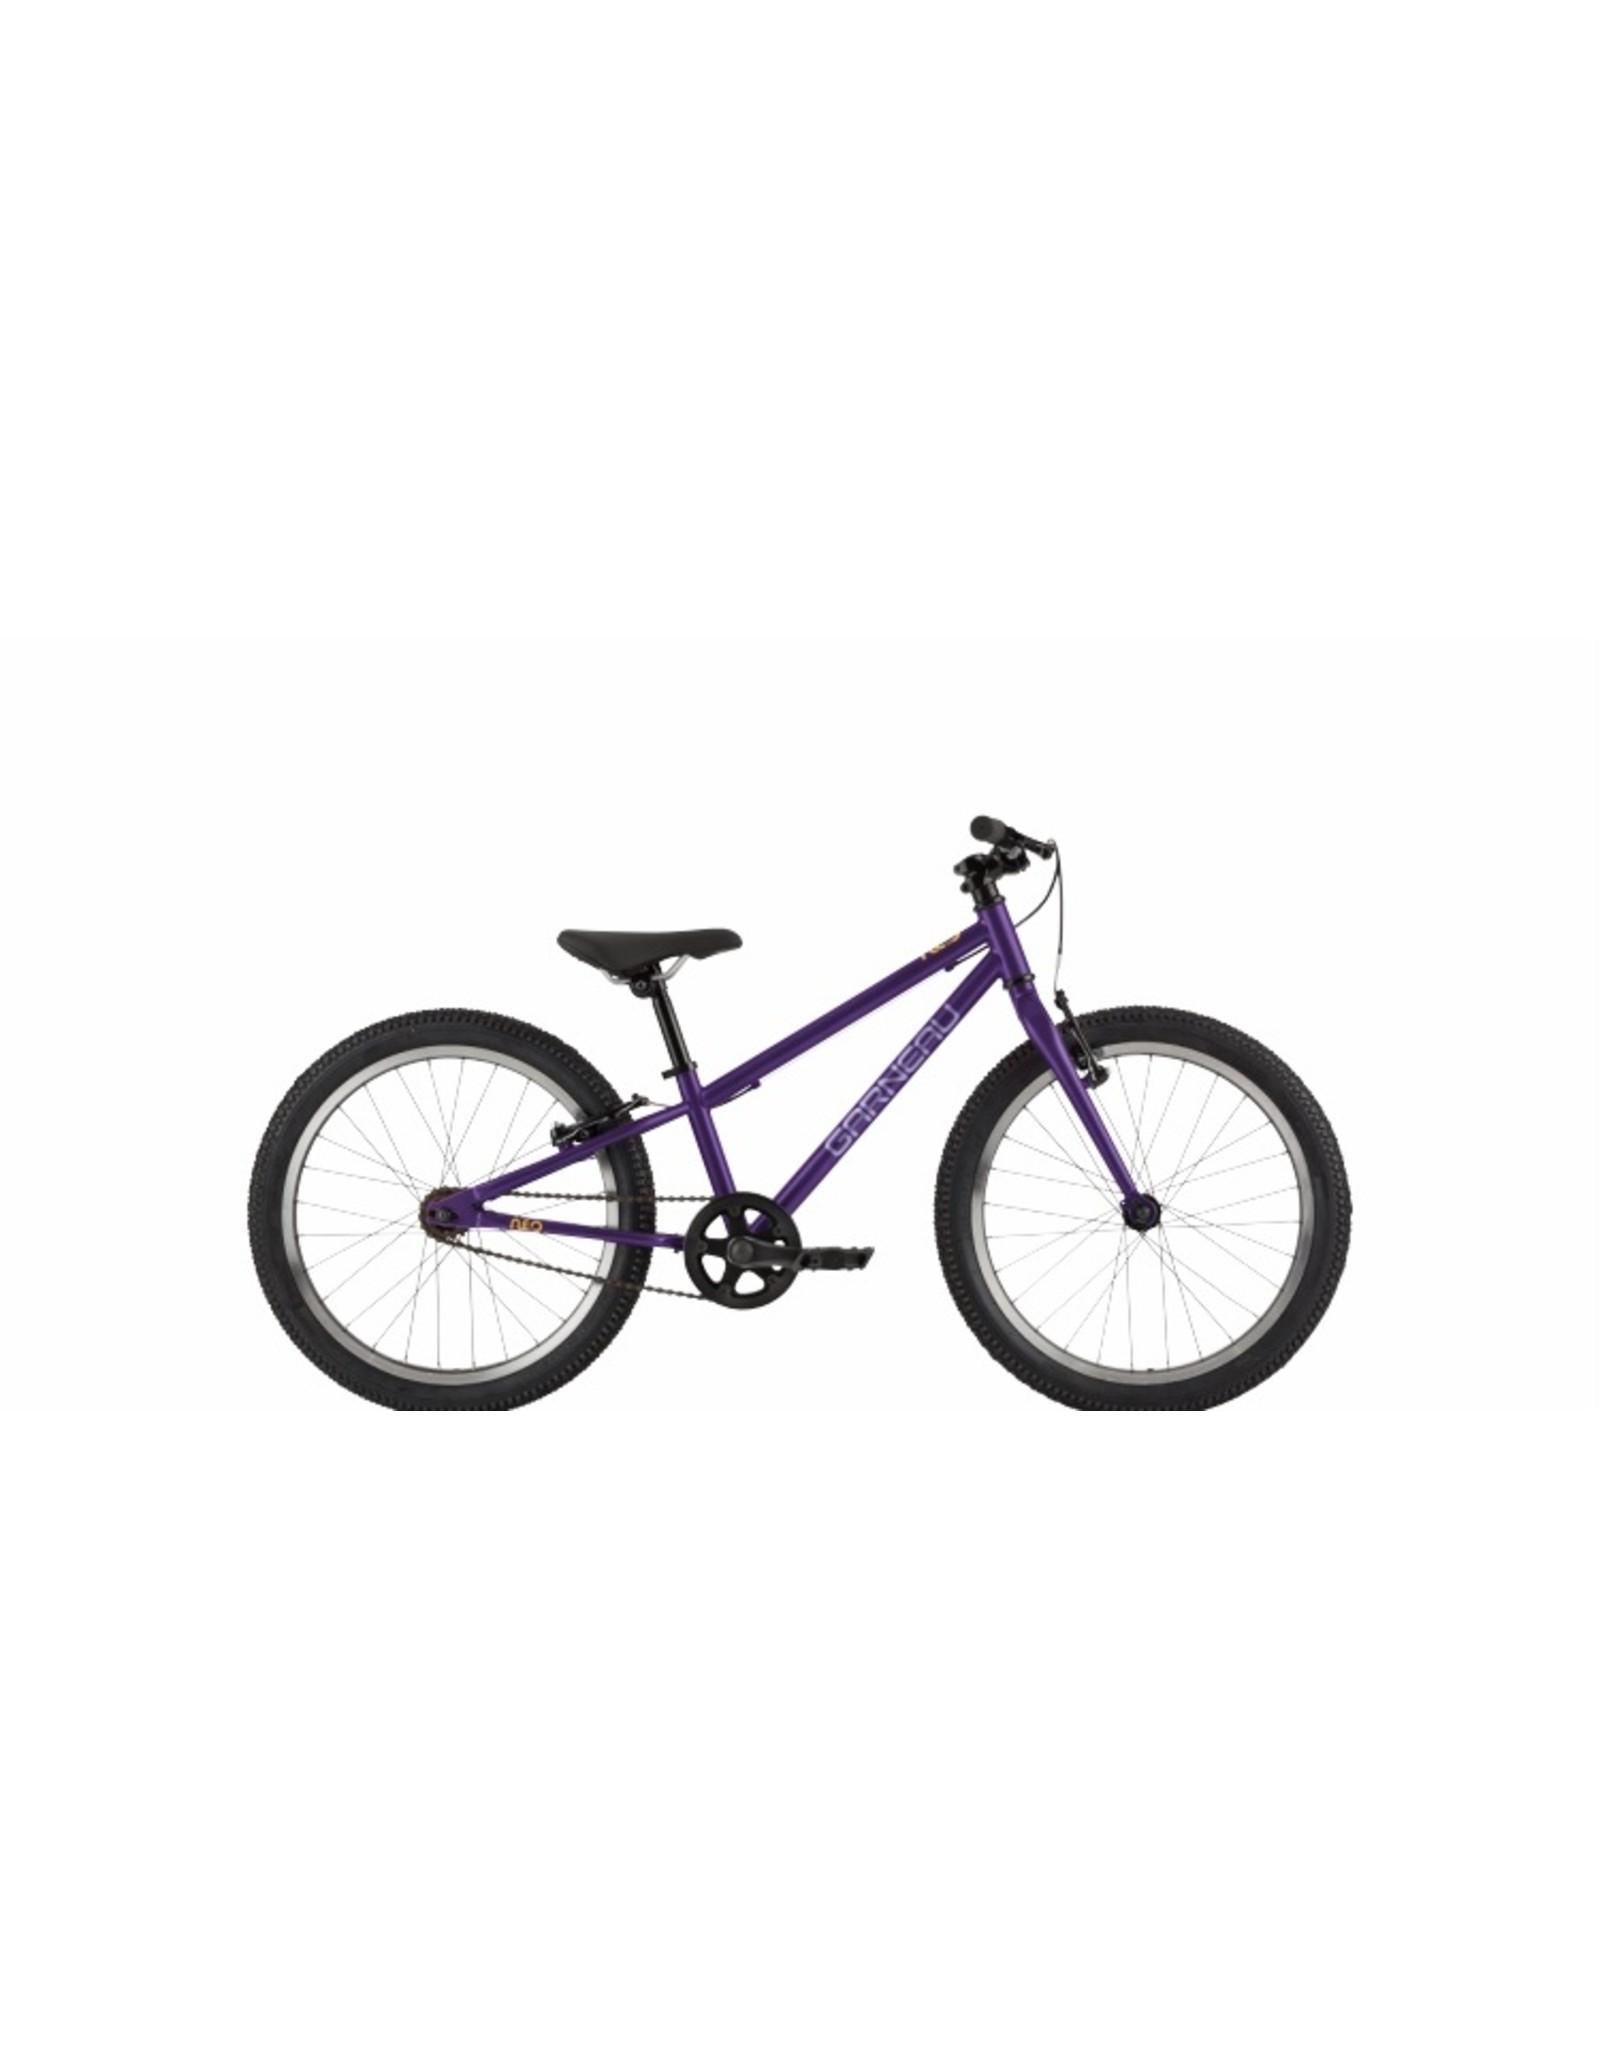 Garneau Garneau Neo 201 Purple 2021 O/S